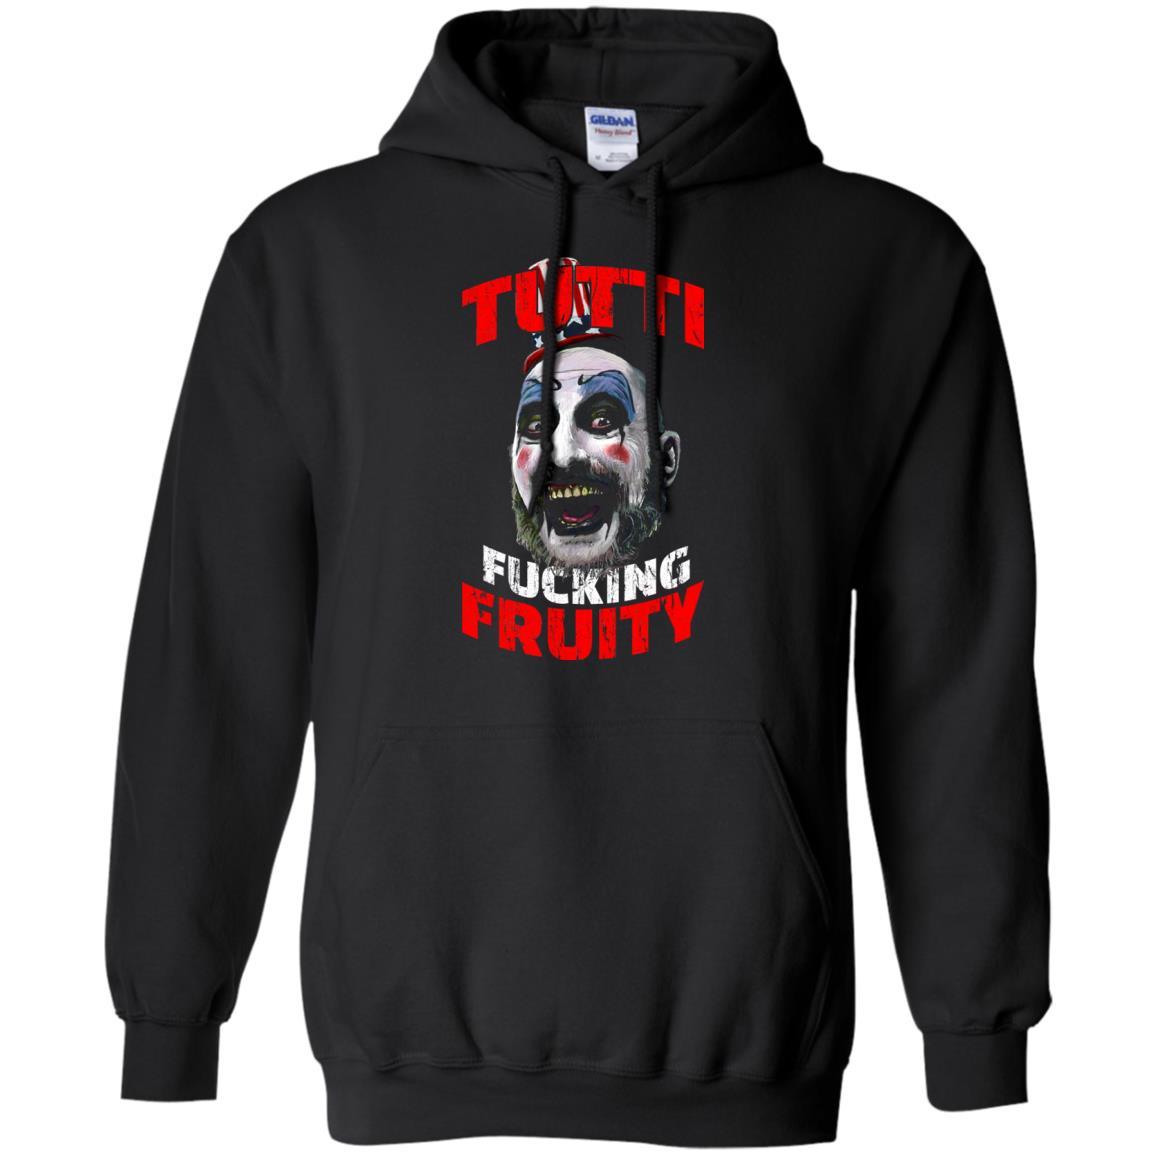 image 205 - Captain Spaulding: Tutti Fucking Fruity shirt, hoodie, tank